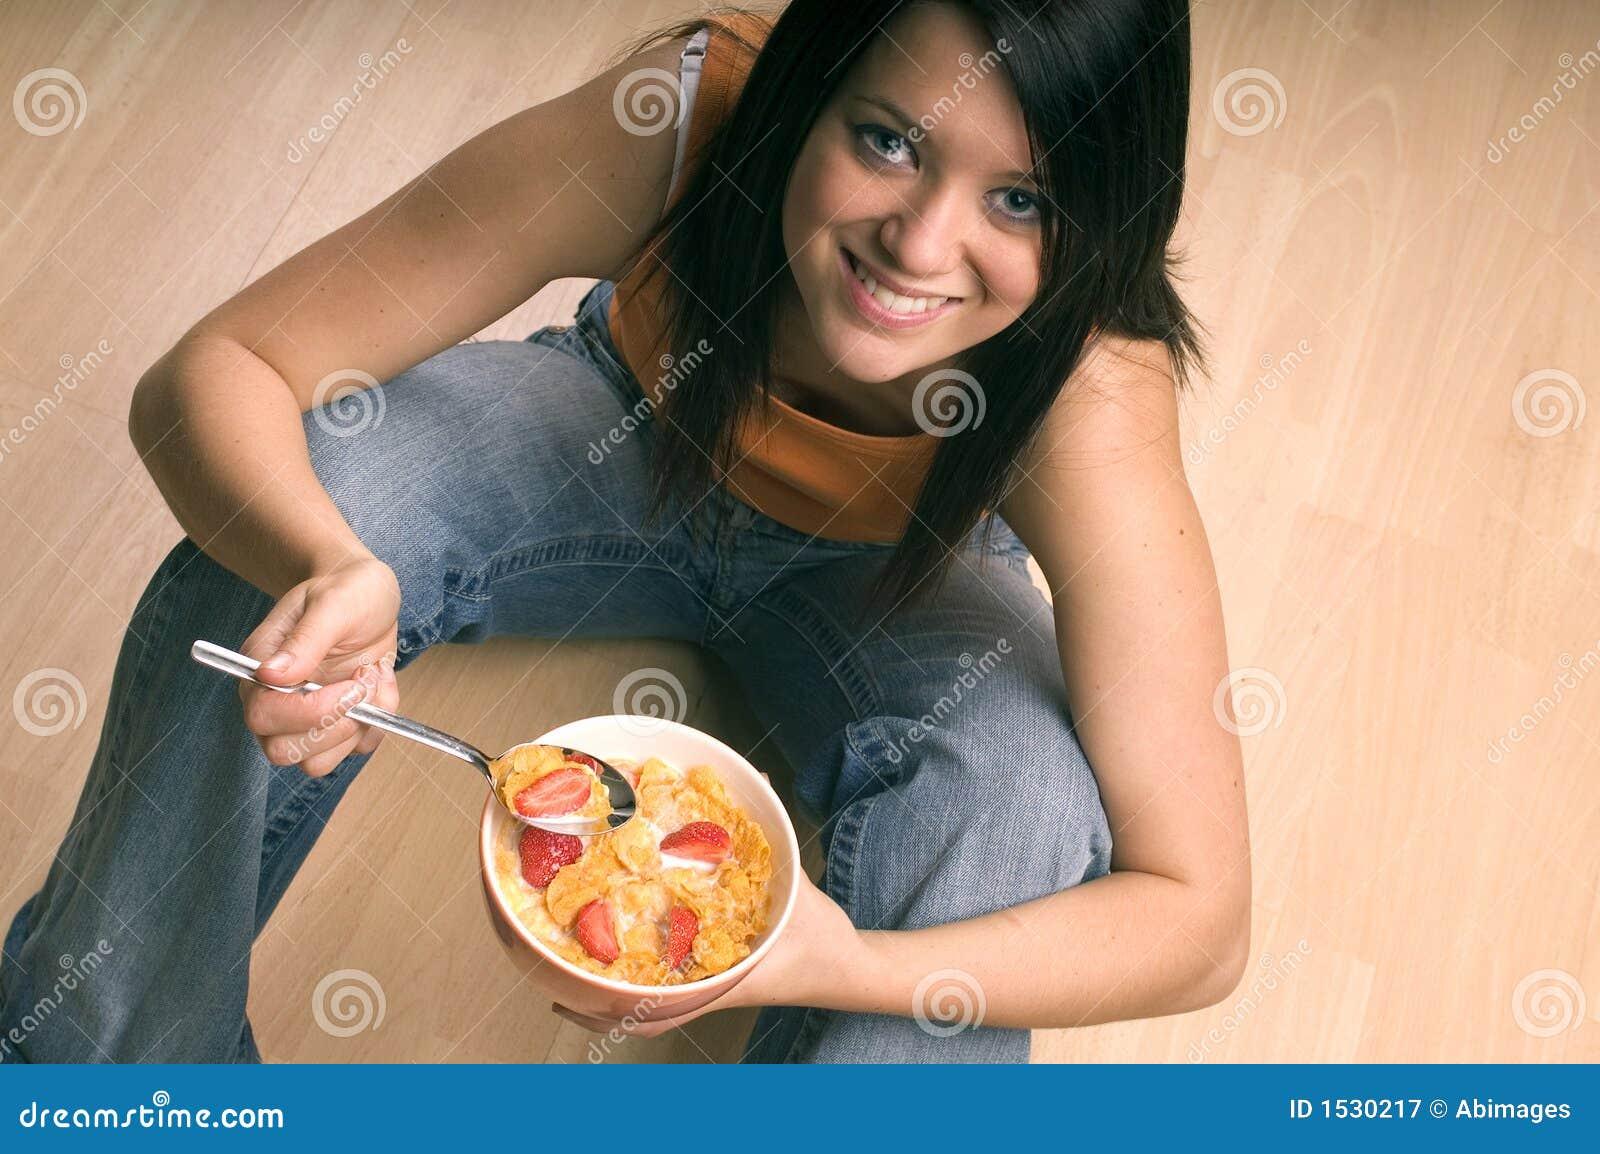 Download Eating breakfast stock image. Image of fruit, milk, smile - 1530217